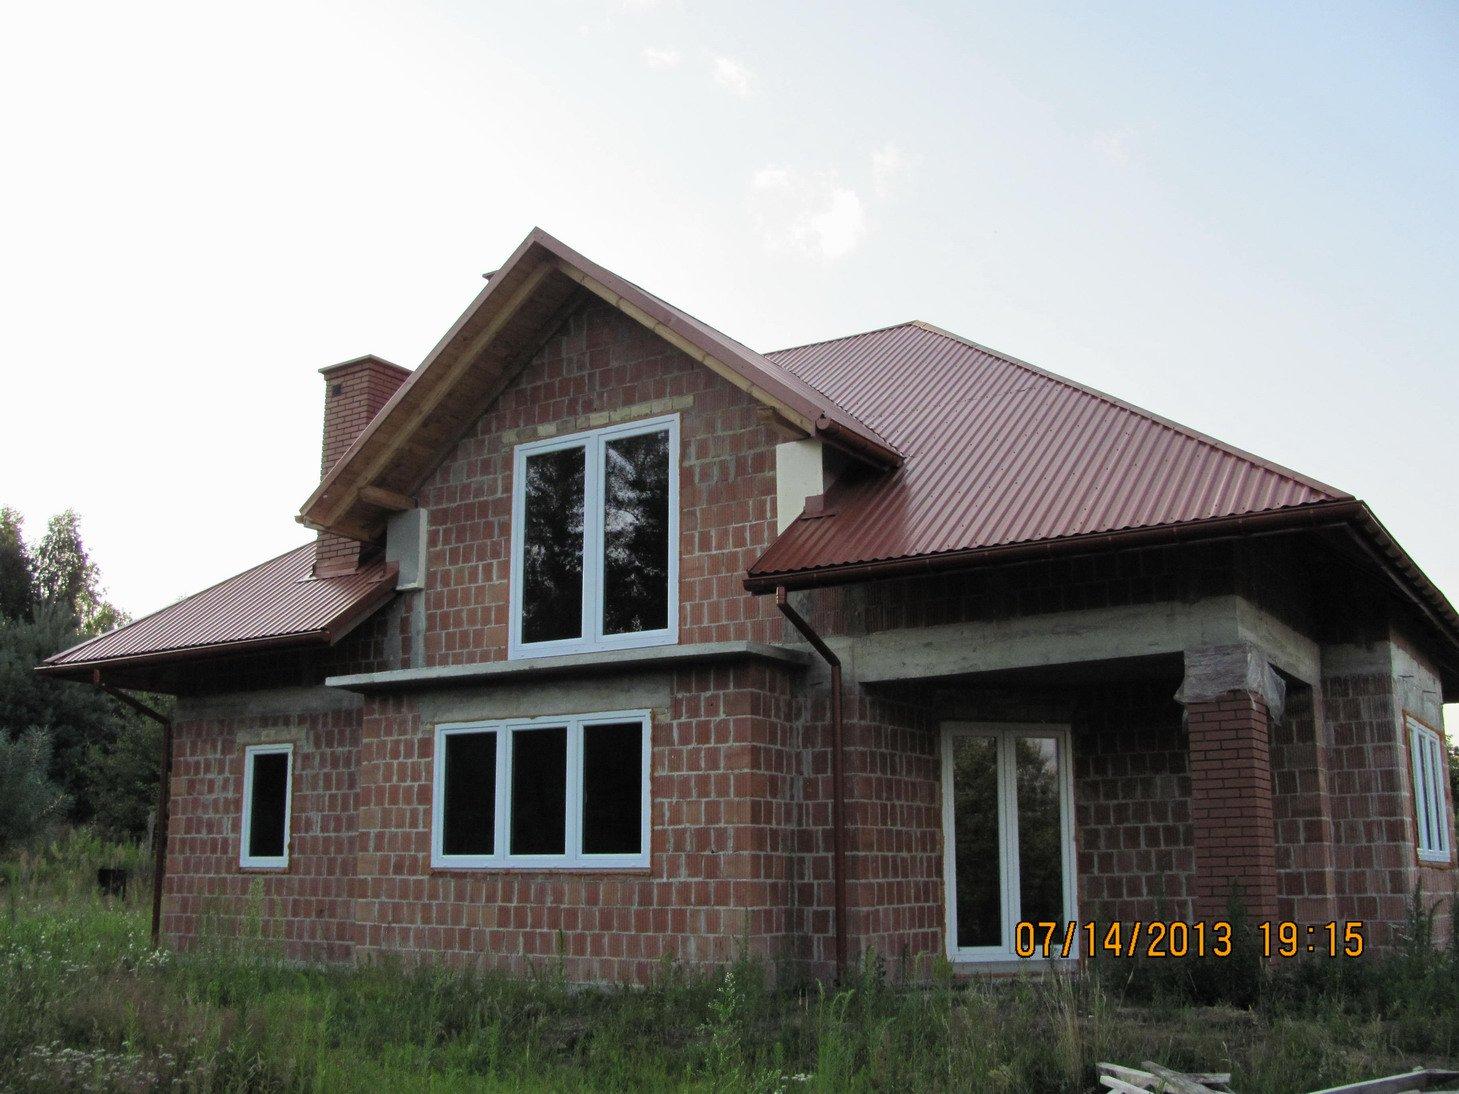 projekt-domu-filip-fot-6-1374839386-hokrozgo.jpg